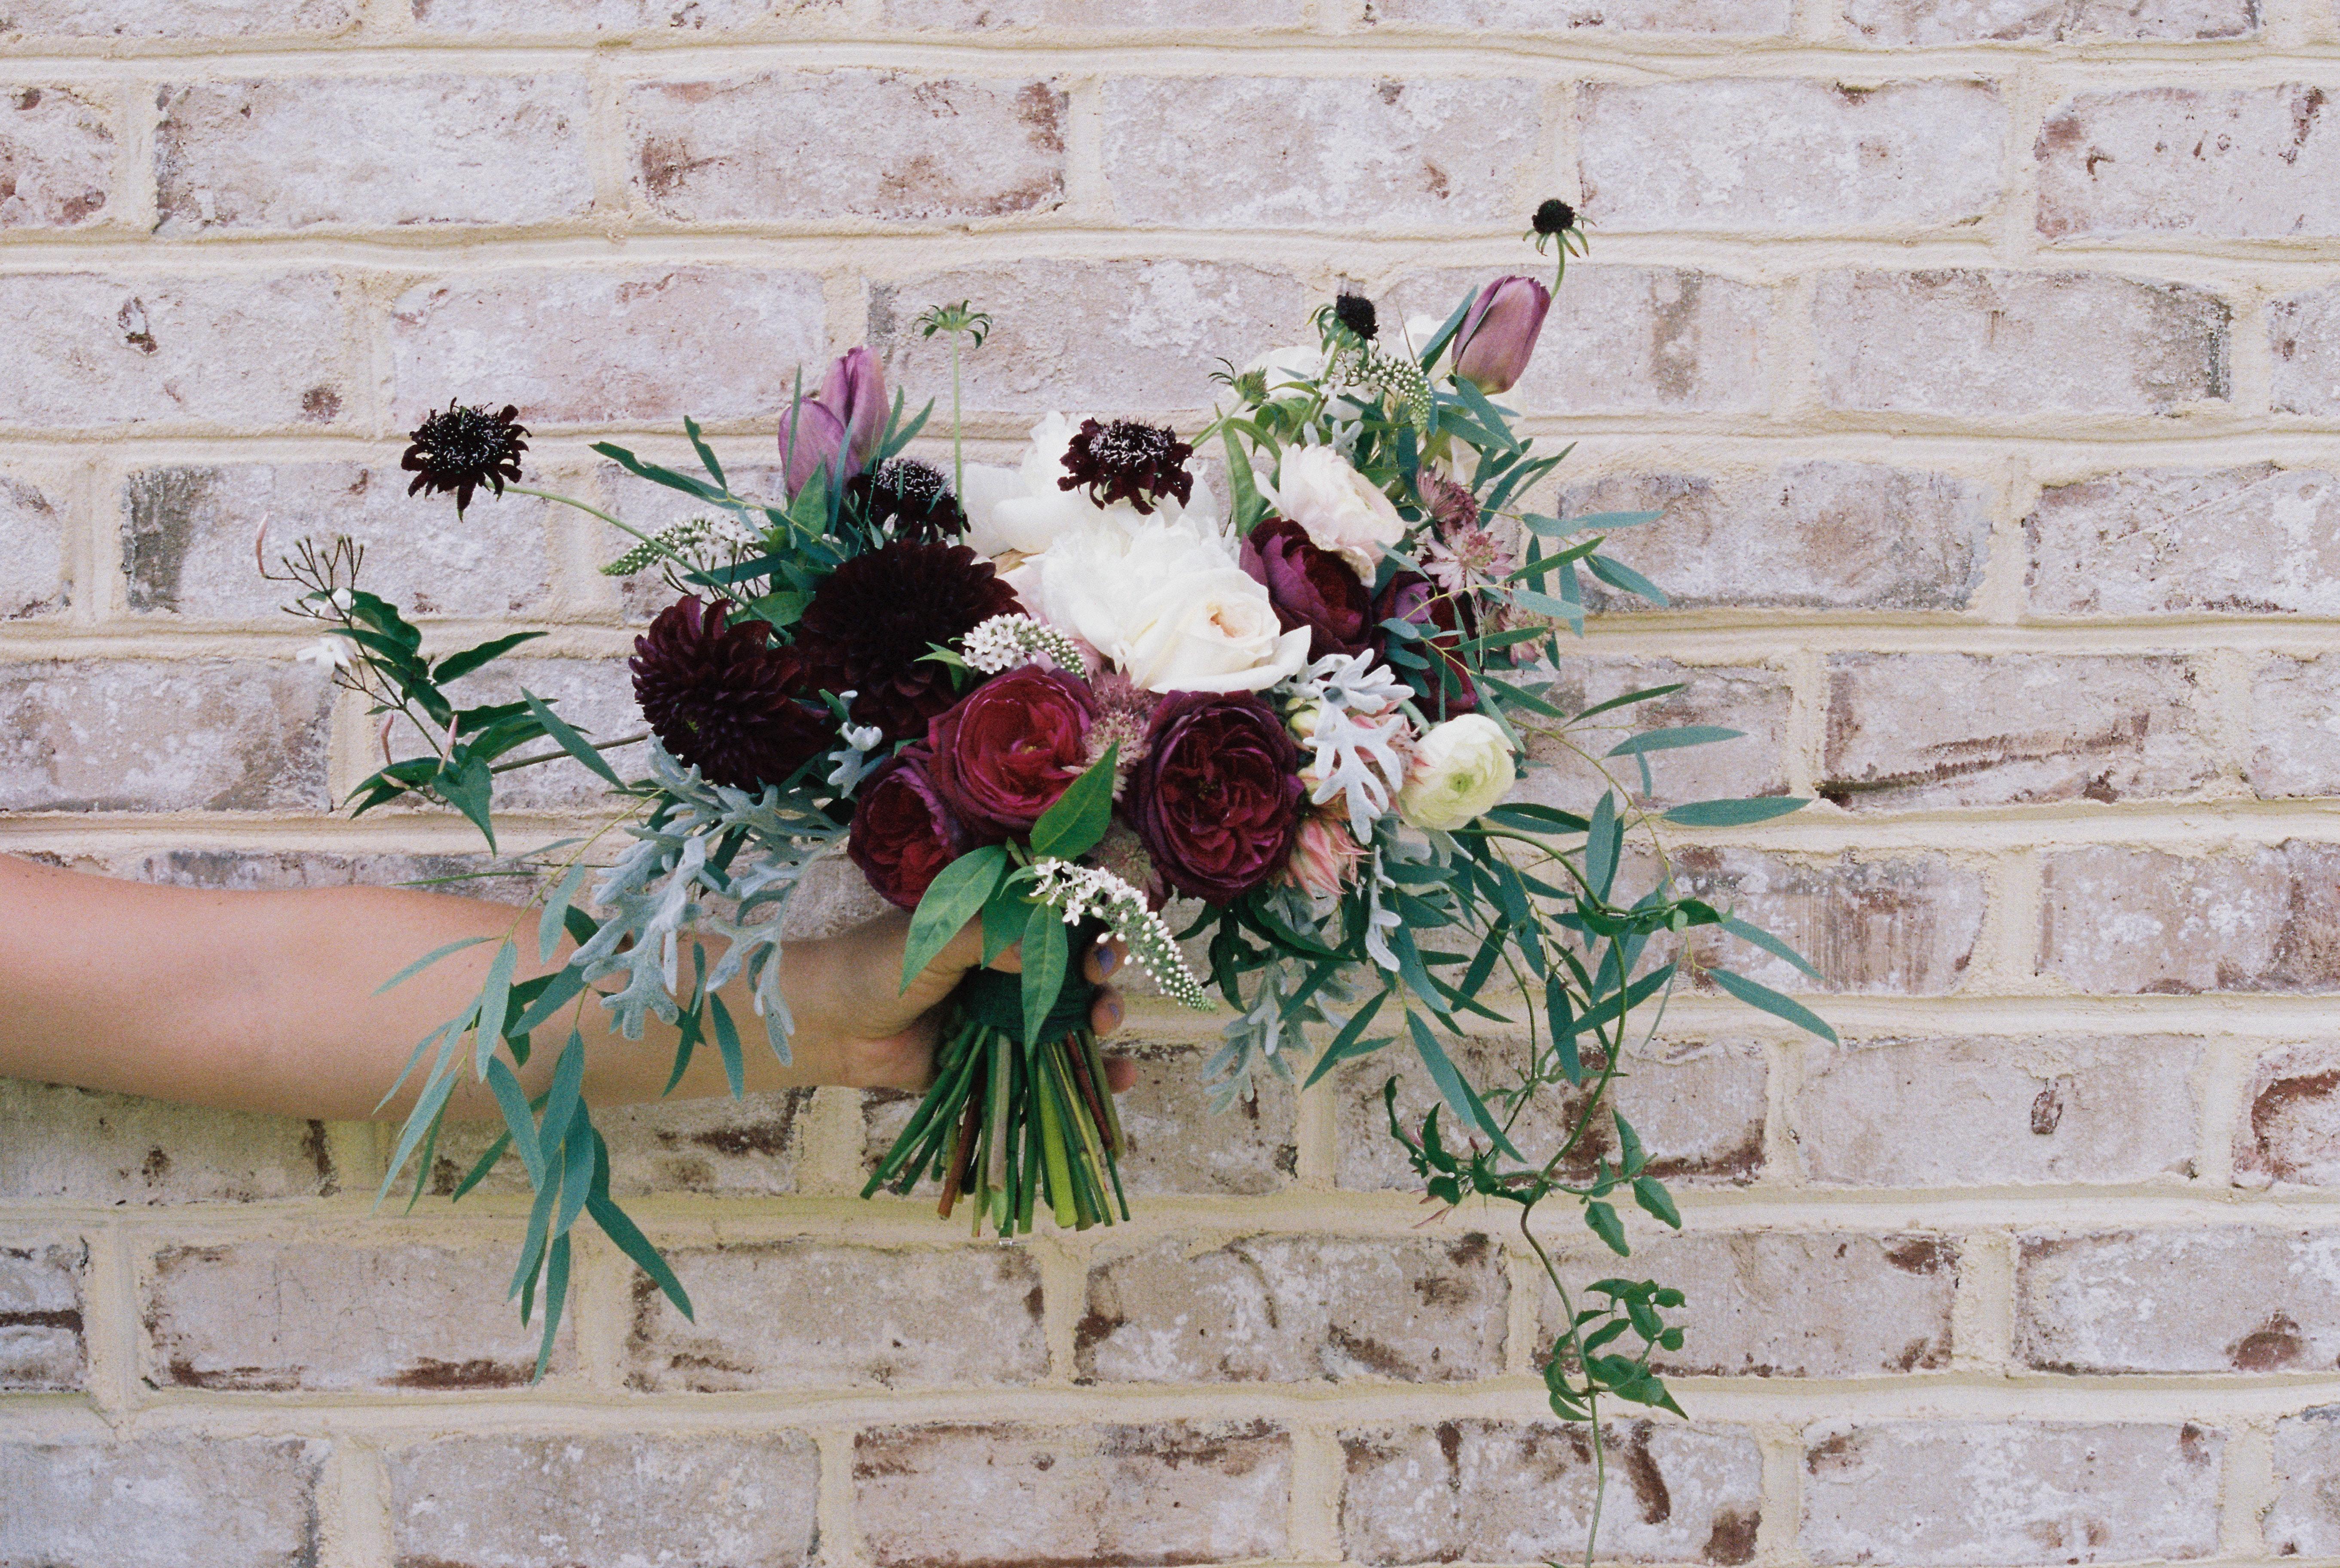 bouquet-bunch-of-flowers-flowers-6742